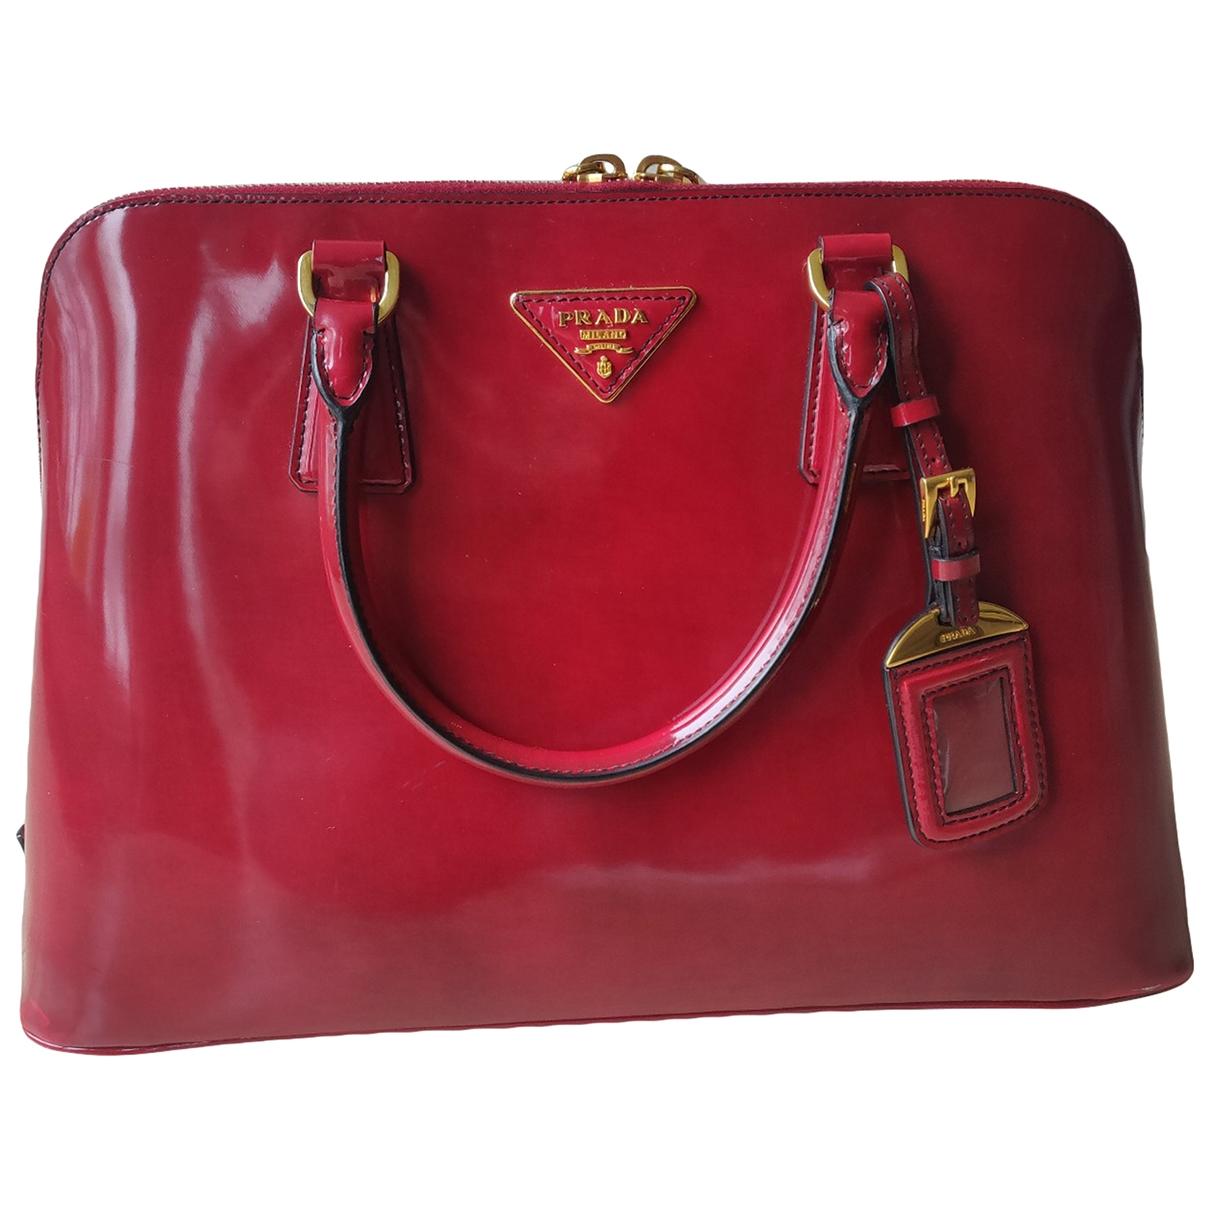 Prada - Sac a main Promenade pour femme en cuir - rouge